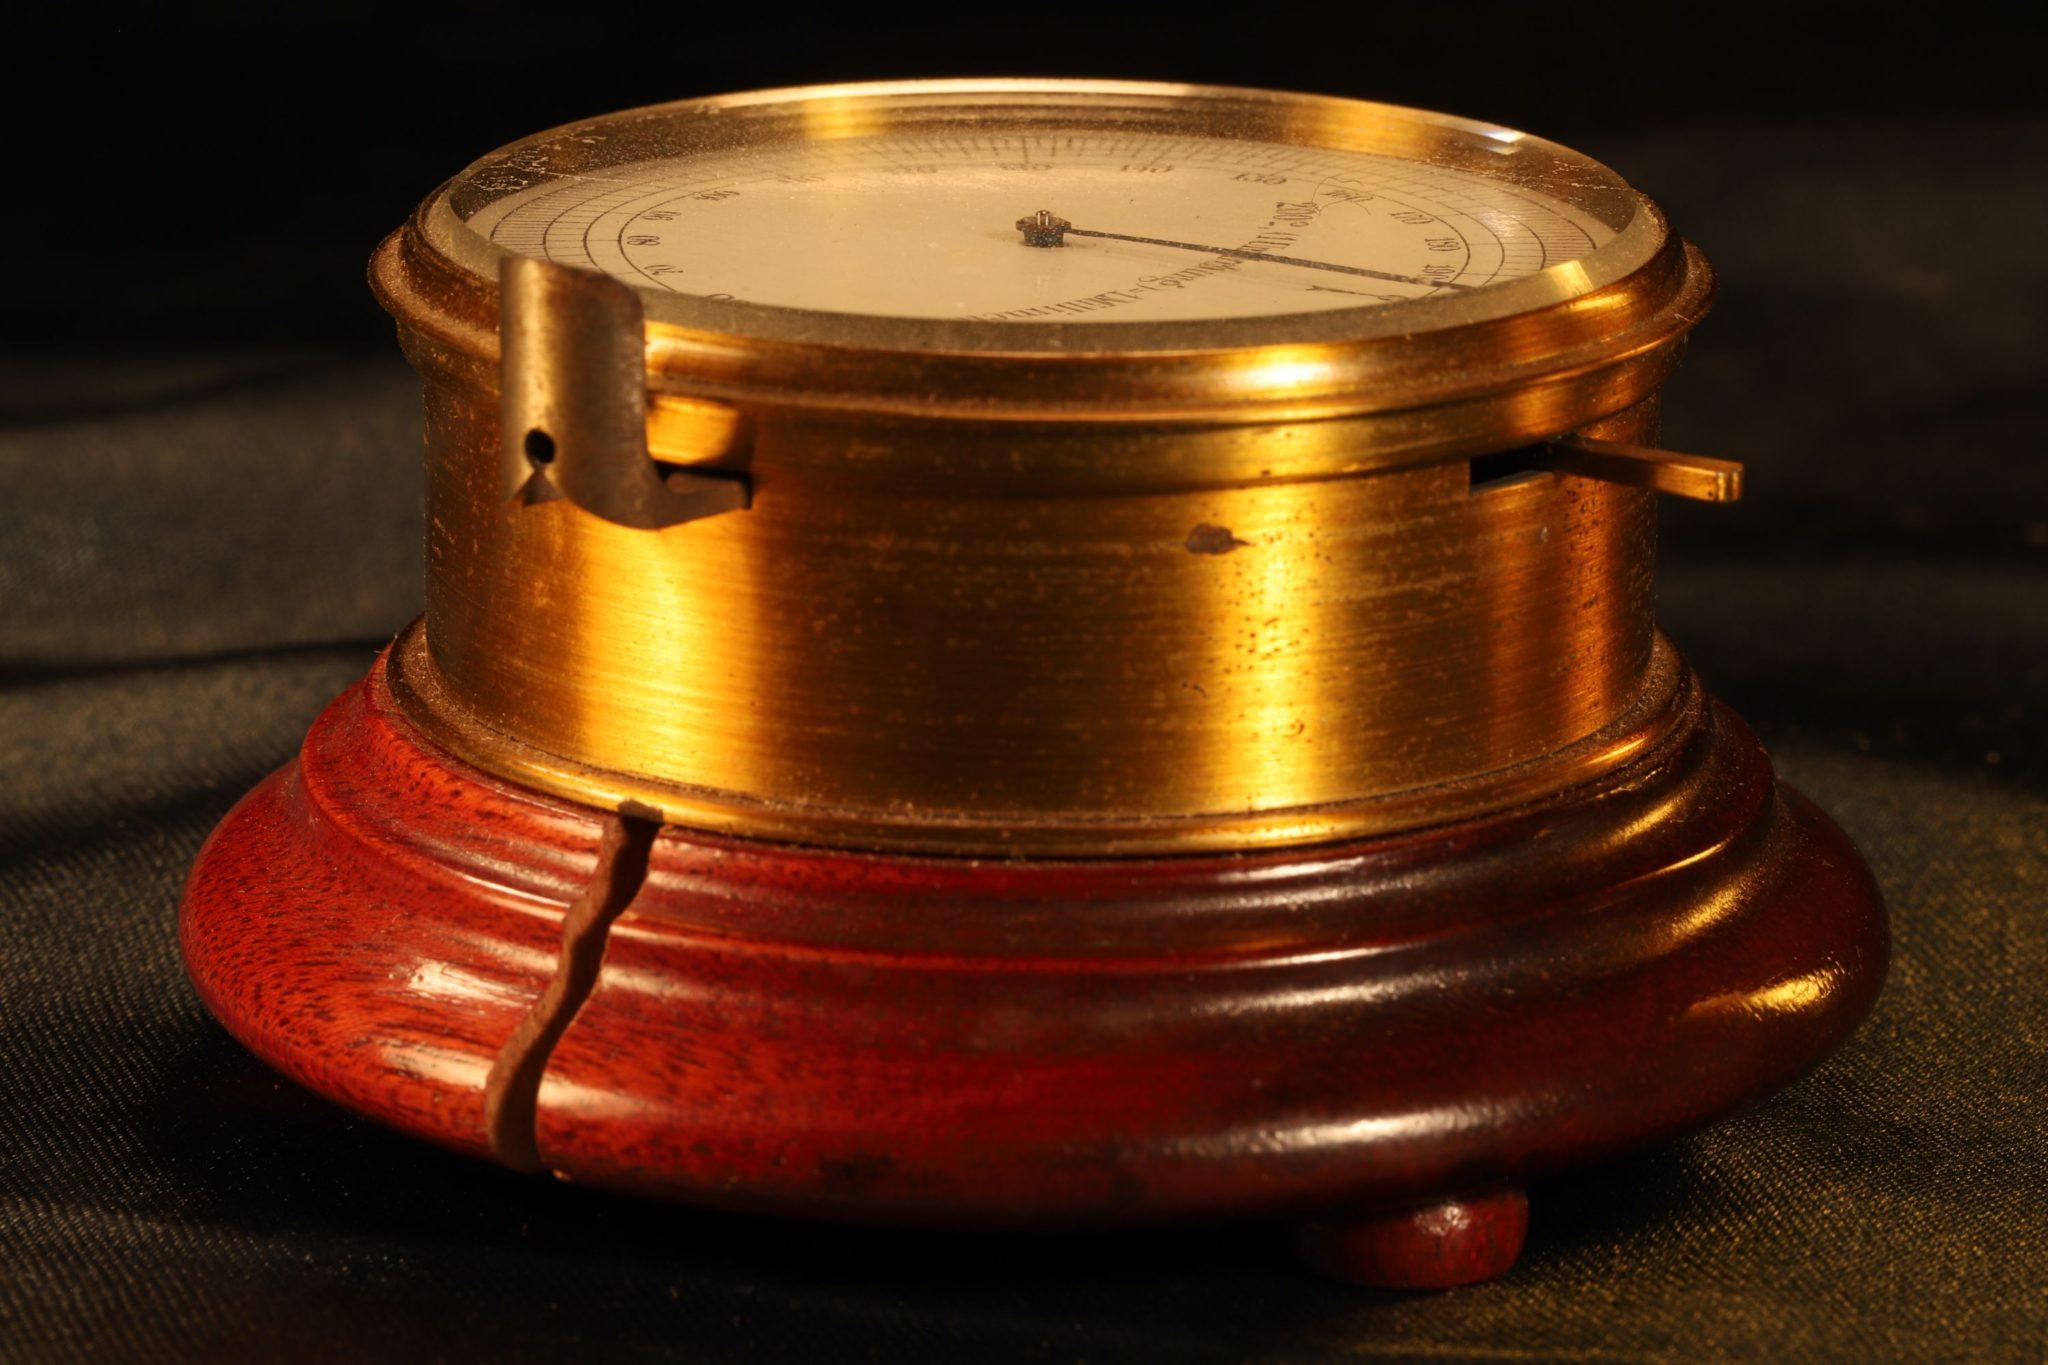 Image of Swiss Watchmakers Micrometer Dial Gauge c1890